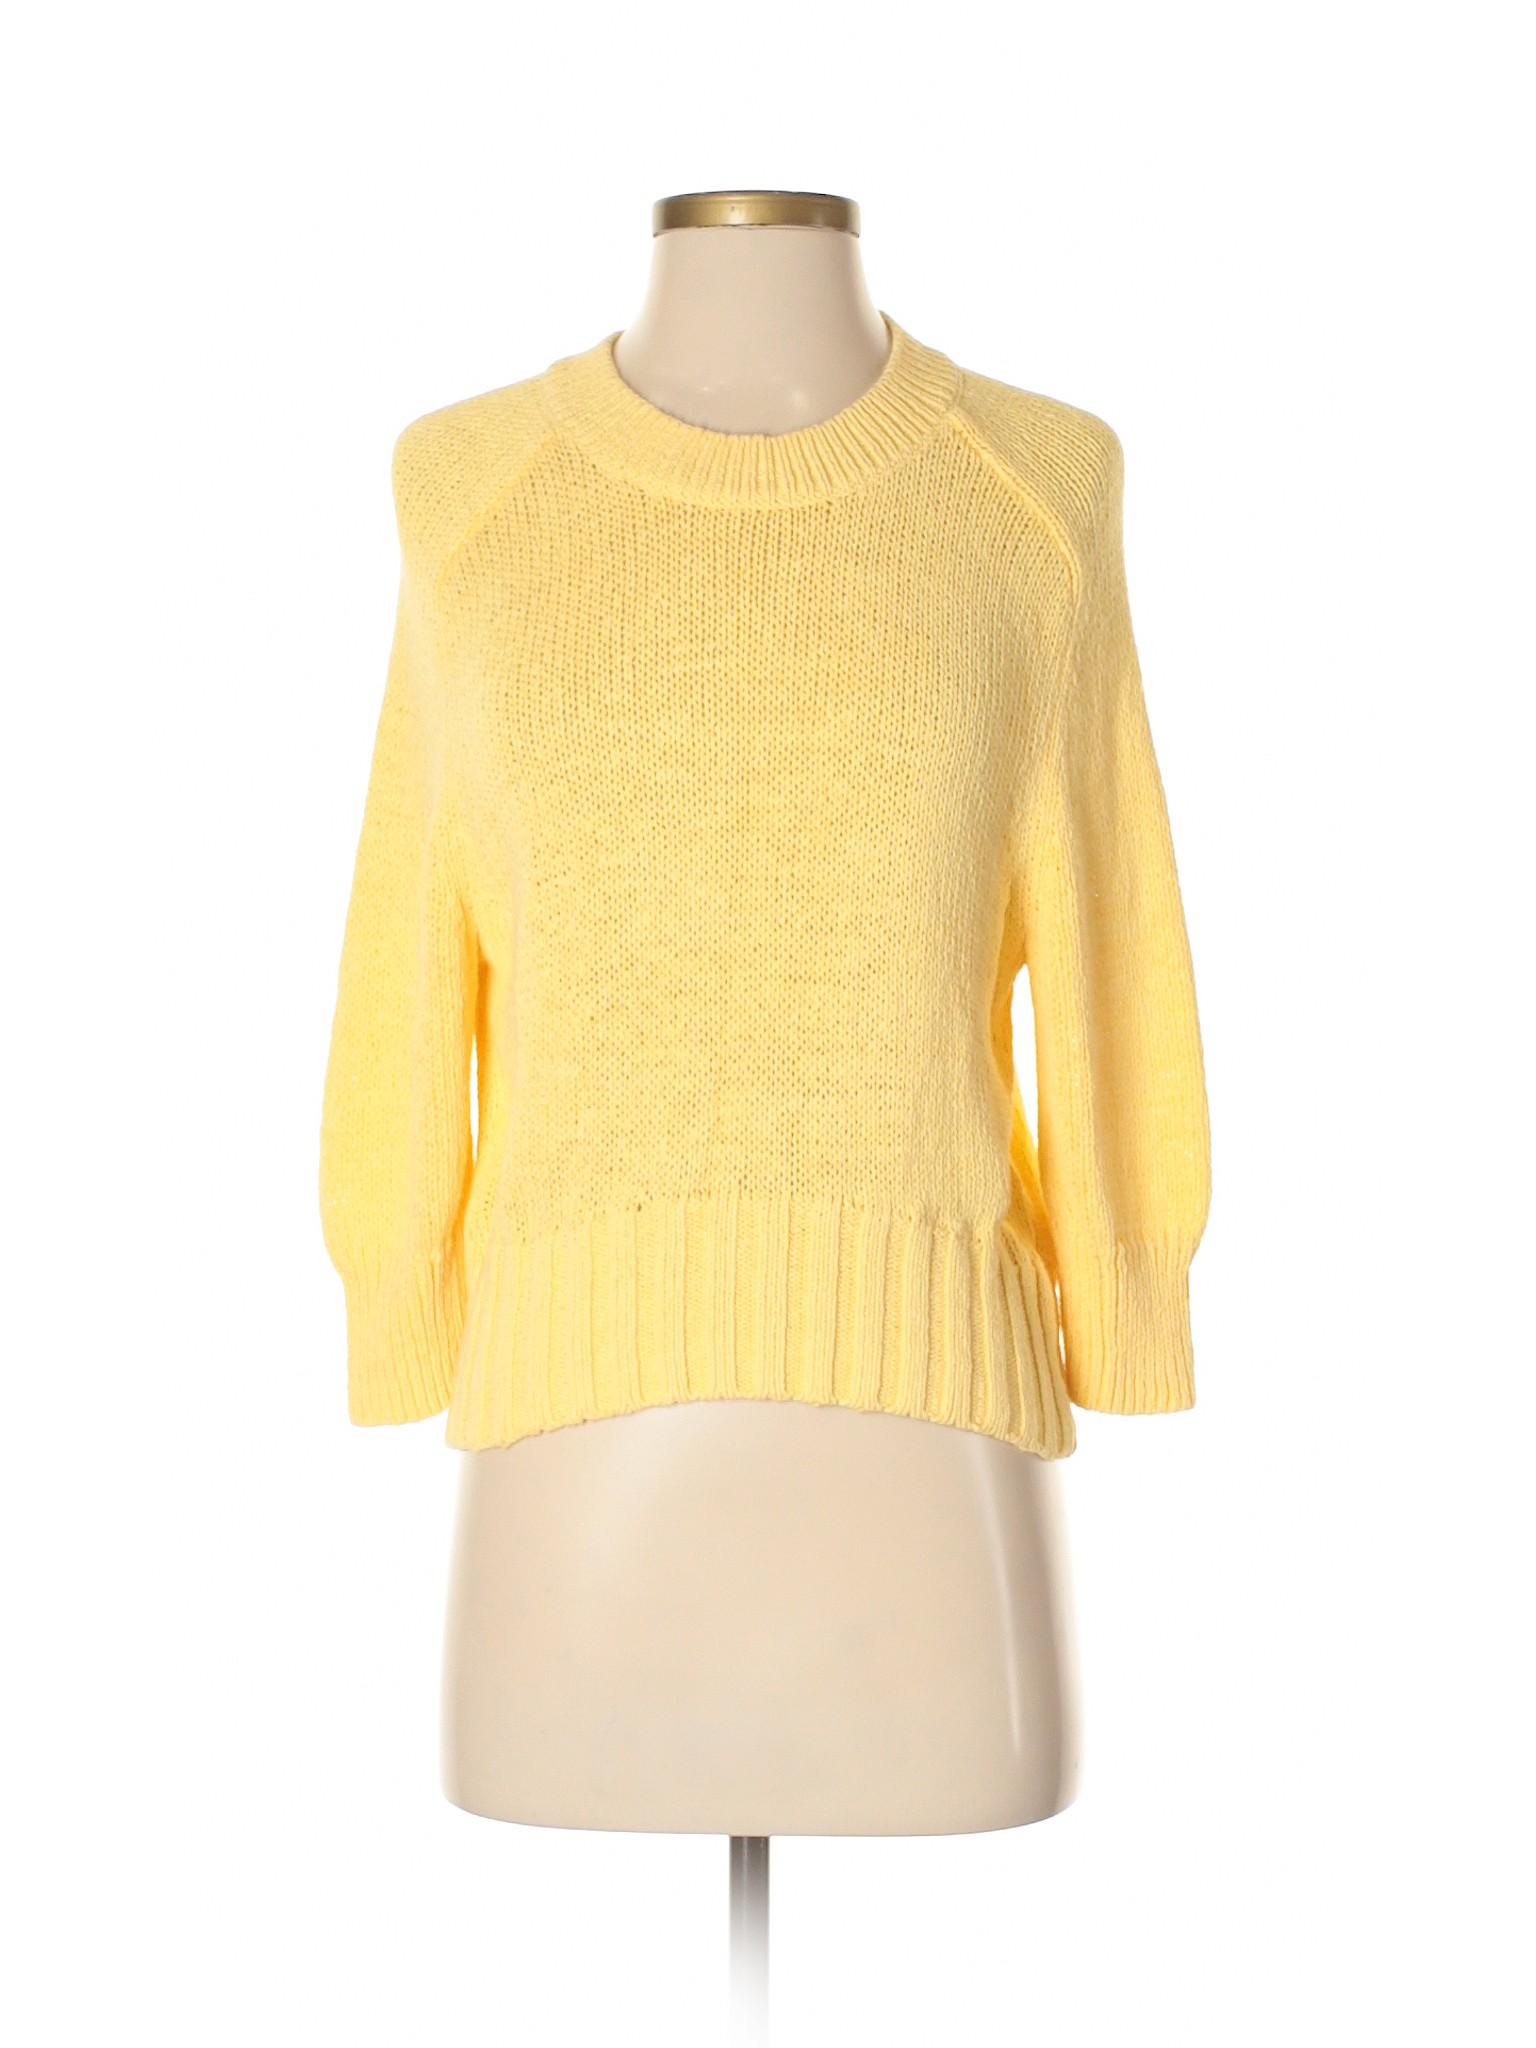 Pullover Pullover Sweater Sweater Pullover Sweater Boutique Gap Gap Boutique Boutique Gap 4AdwqzxX4